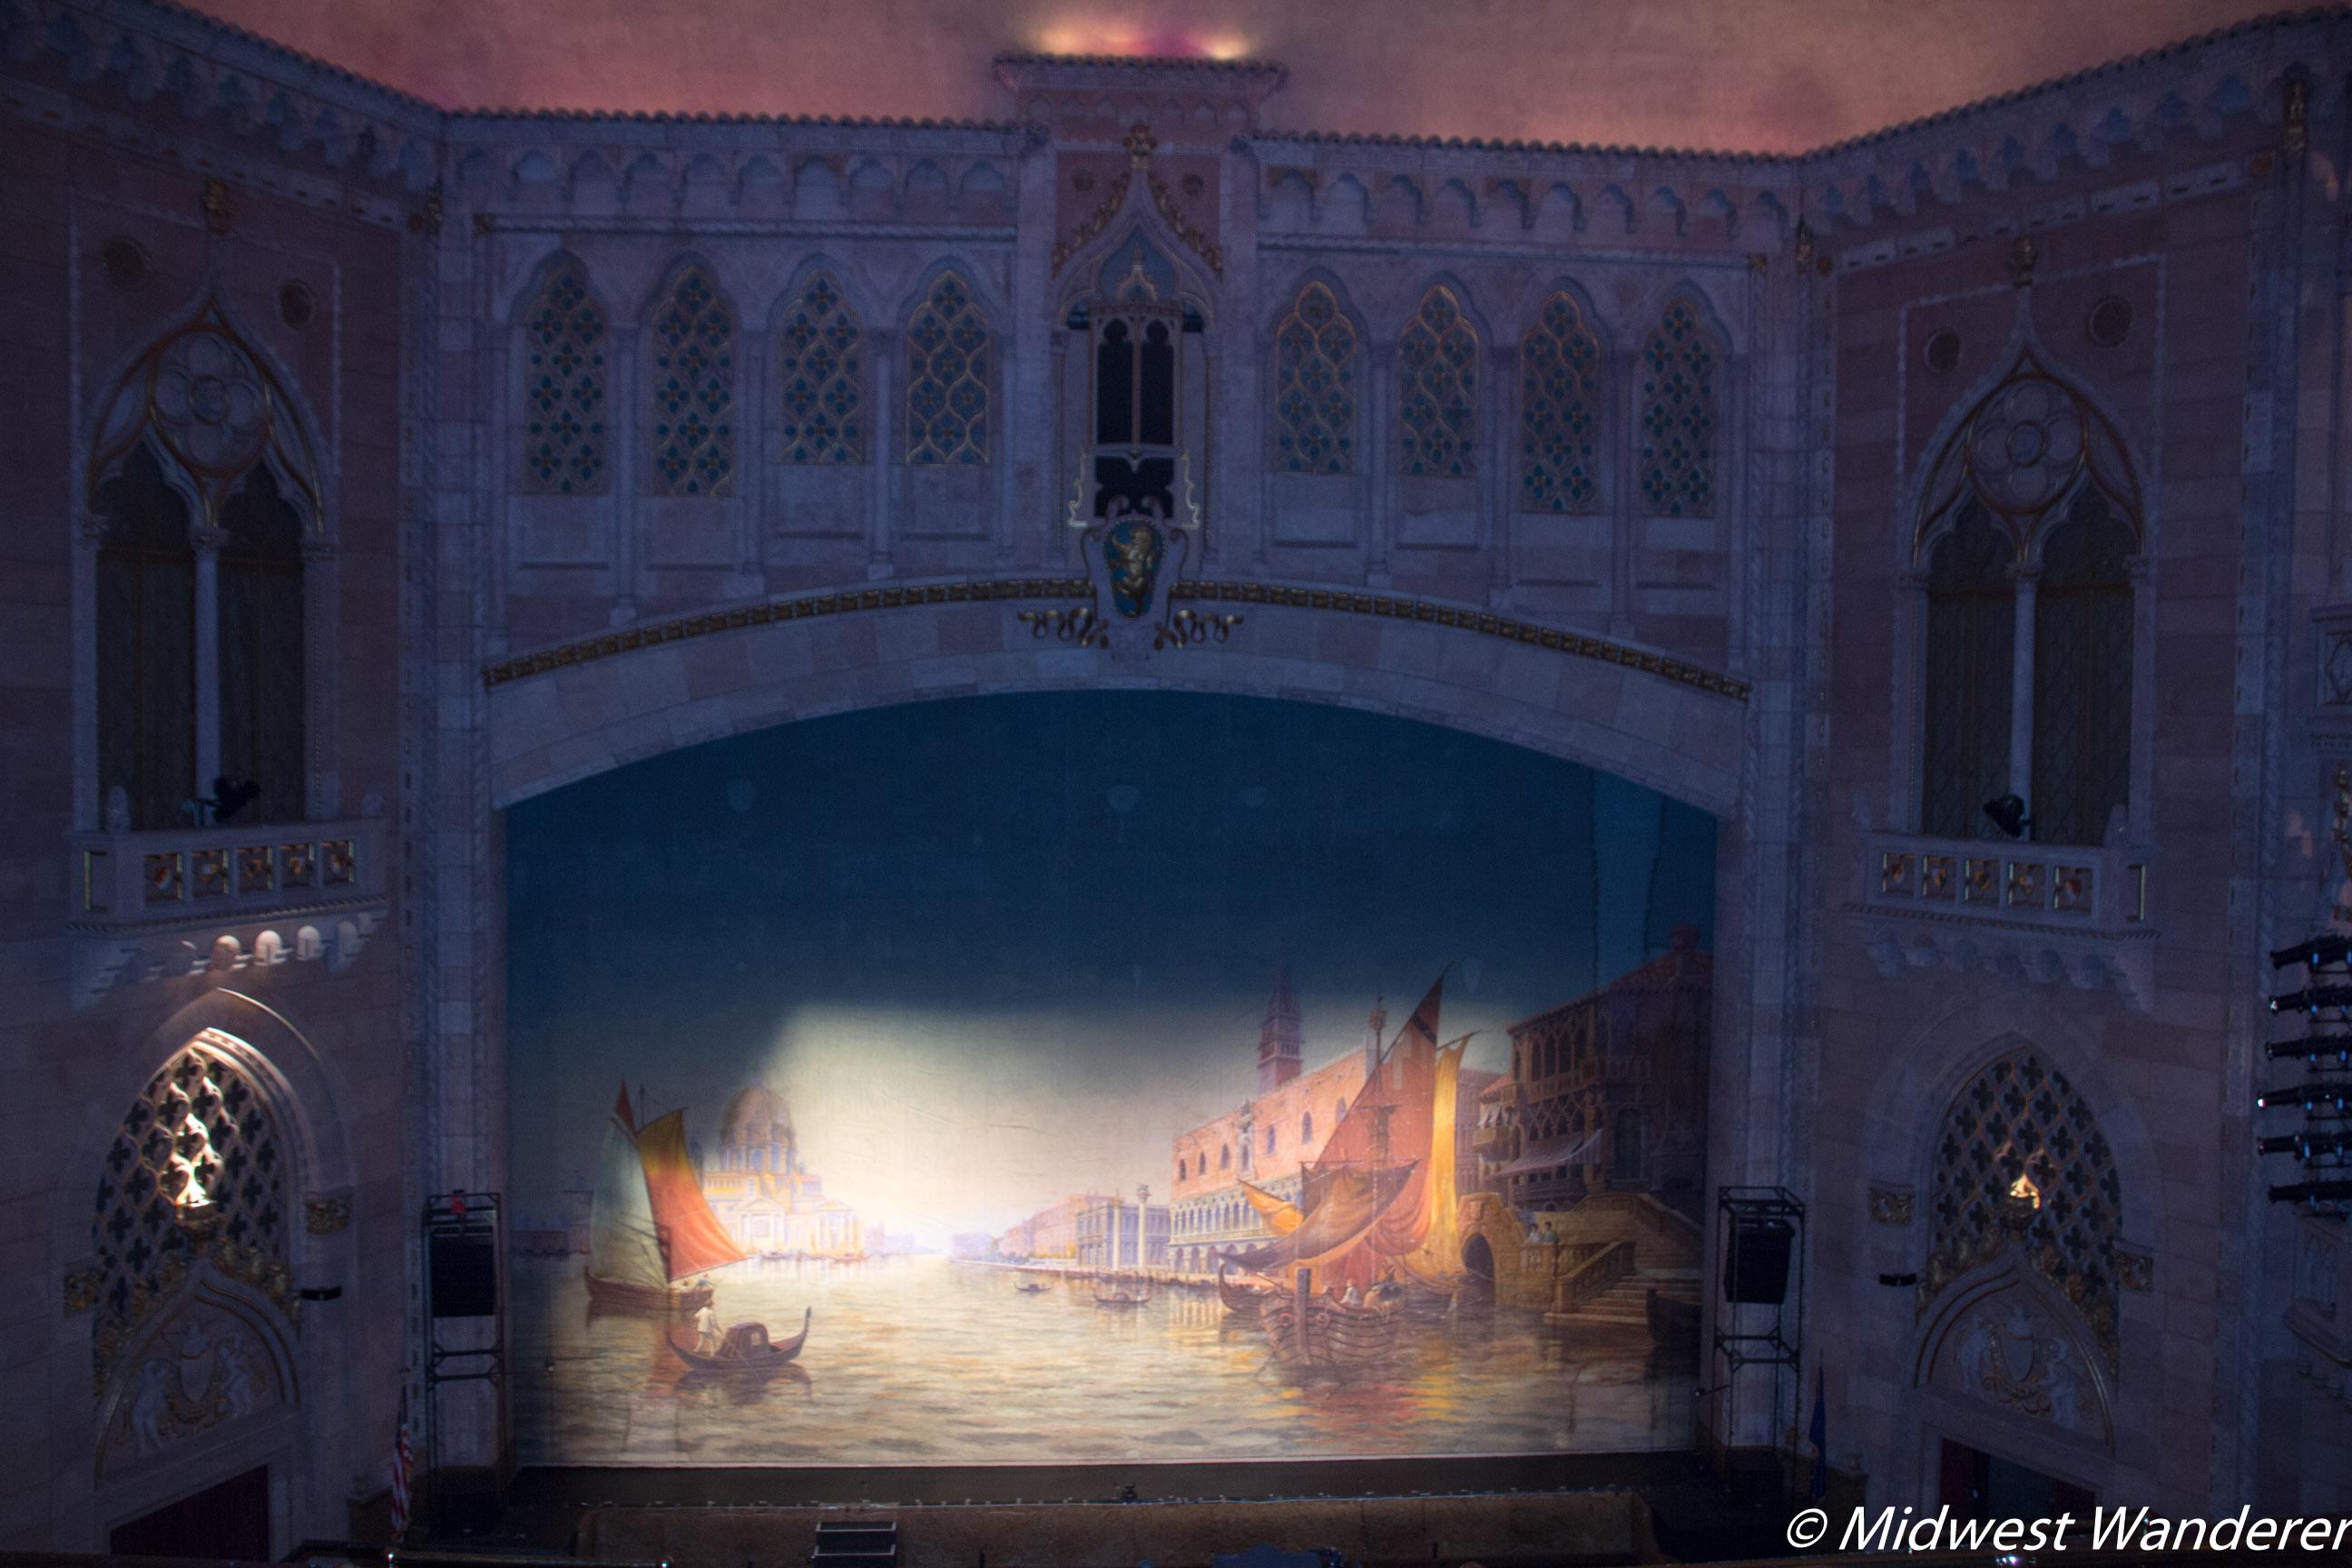 Hershey Theatre Lower Balcony View 3